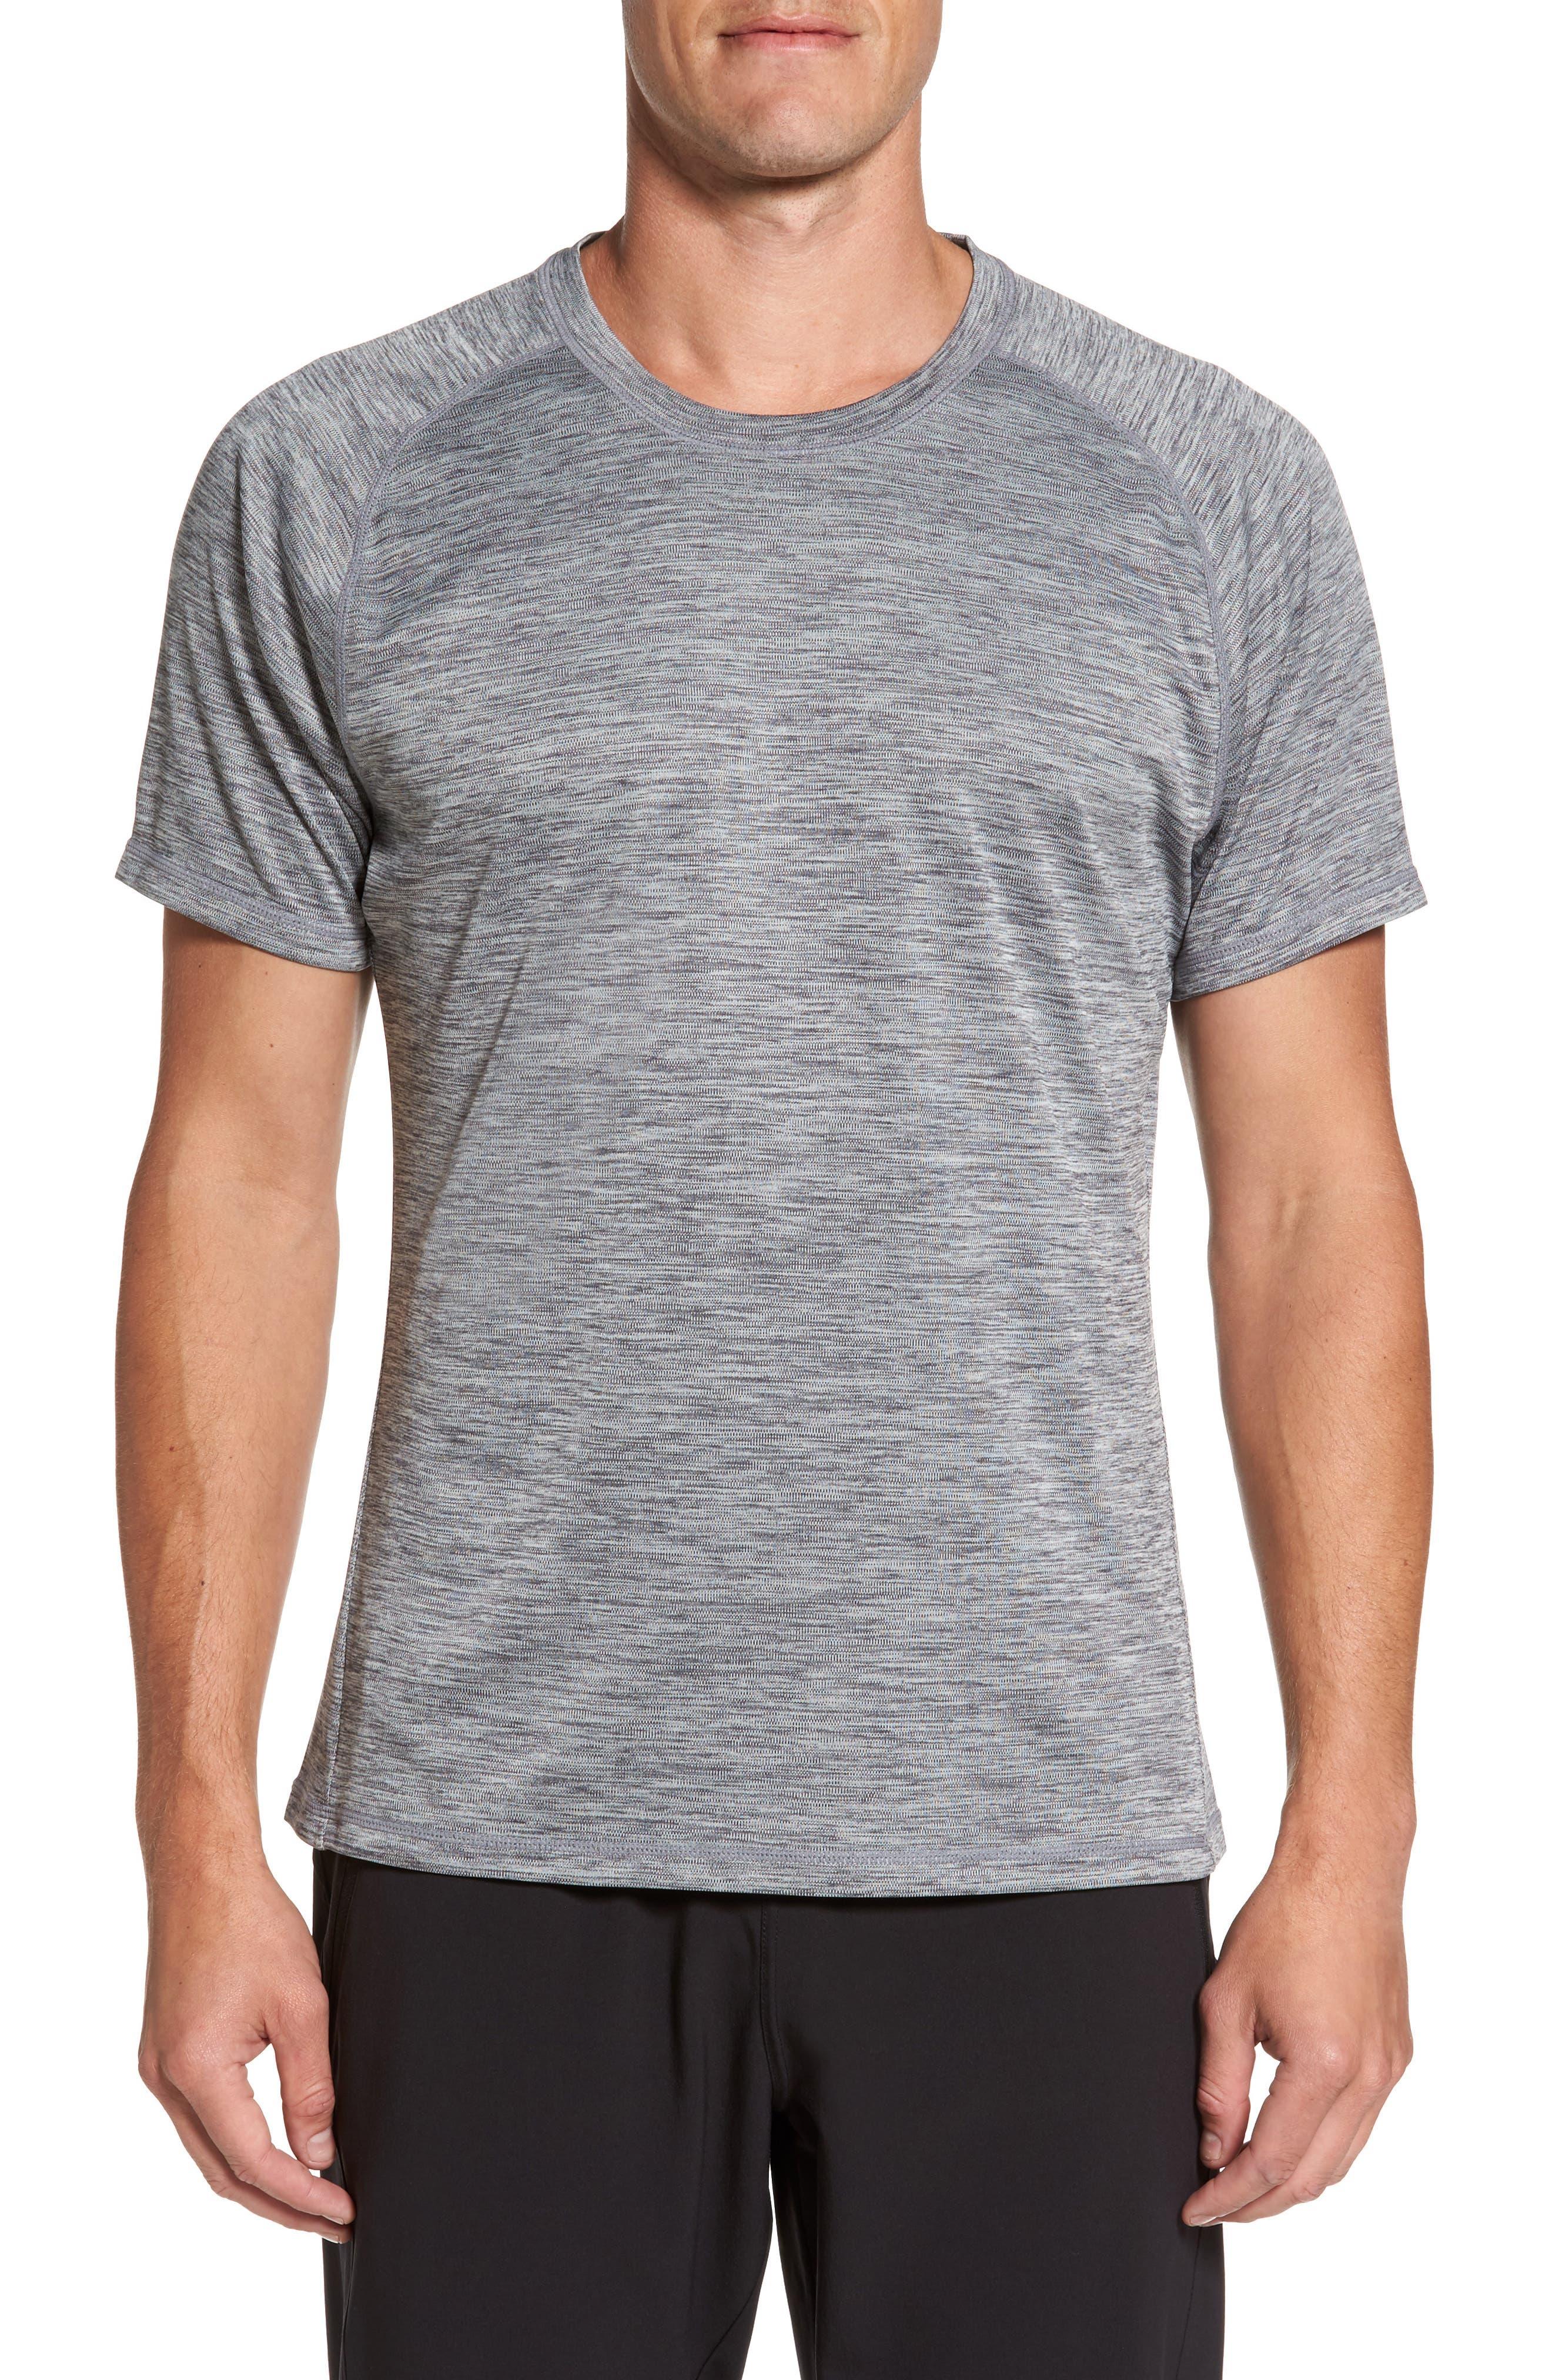 ZELLA,                             Triplite T-Shirt,                             Main thumbnail 1, color,                             050